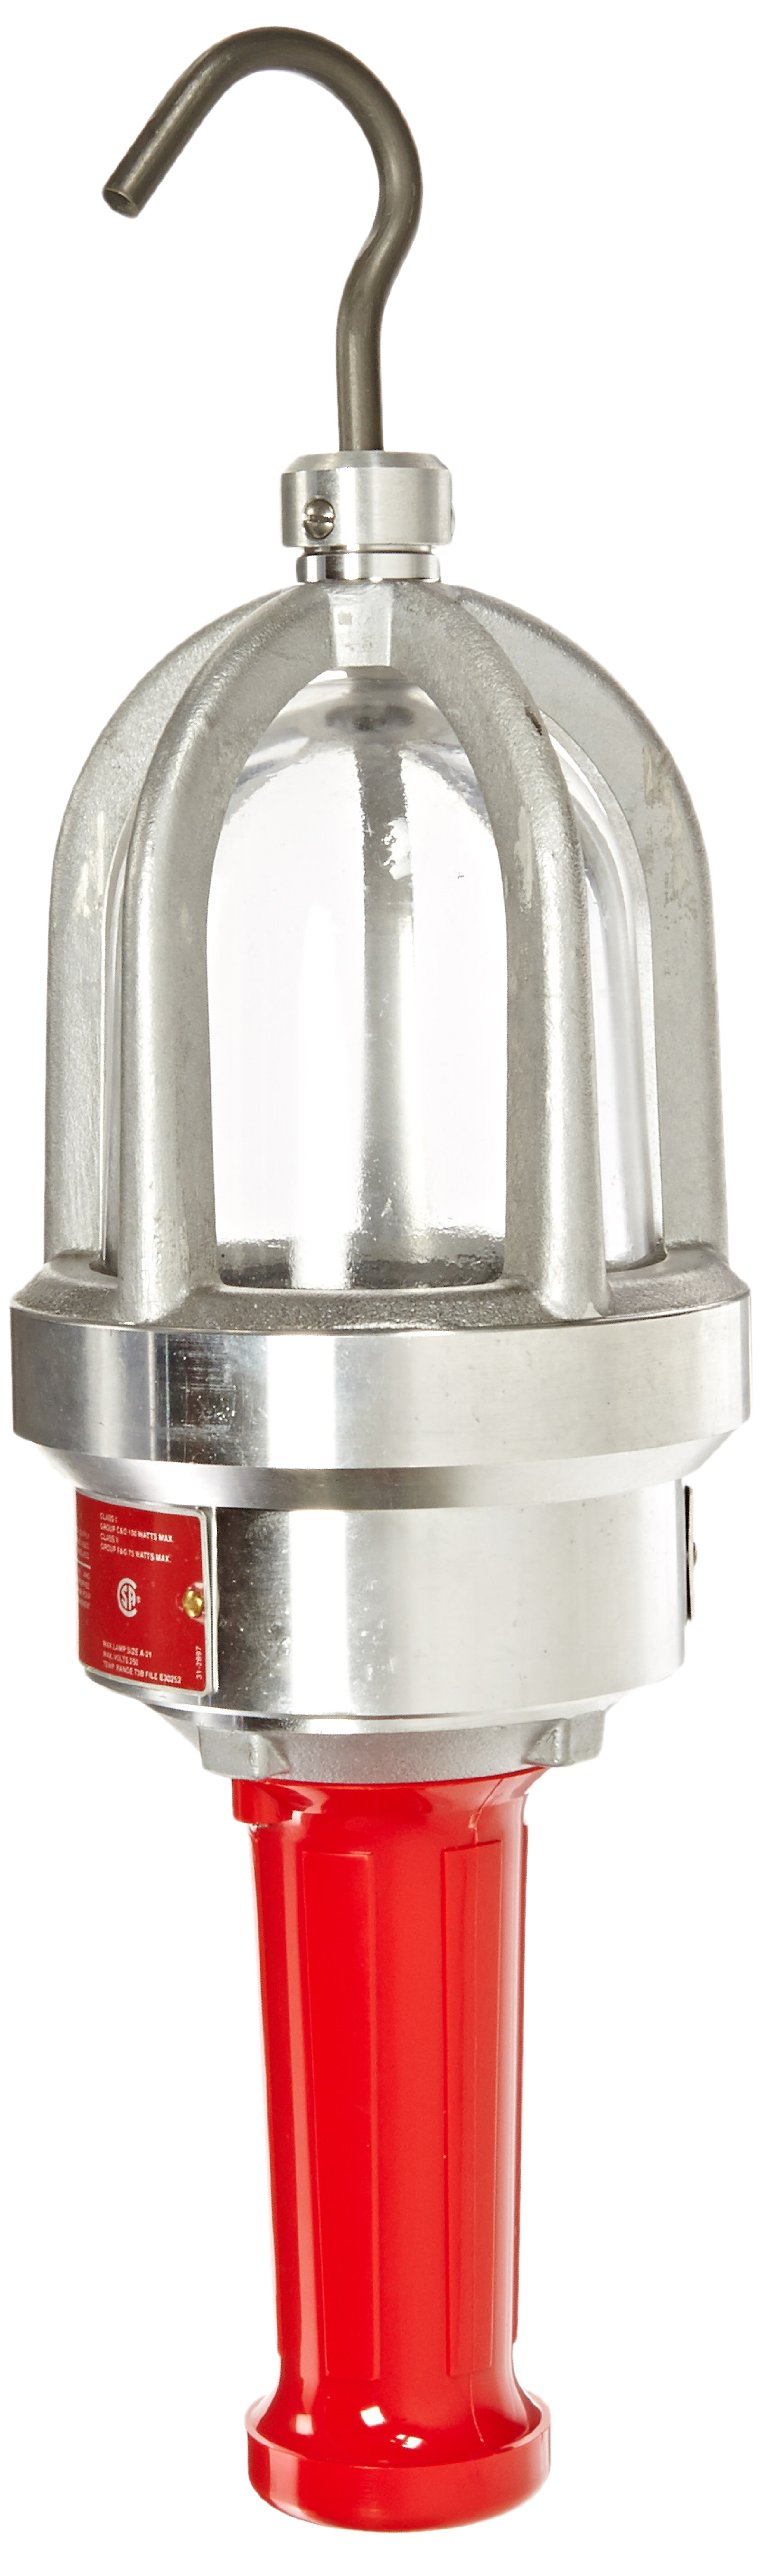 Woodhead 61430 Haztex Handlamp, Hazardous Location, Incandescent Bulb, 100W Maximum Lamp Wattage